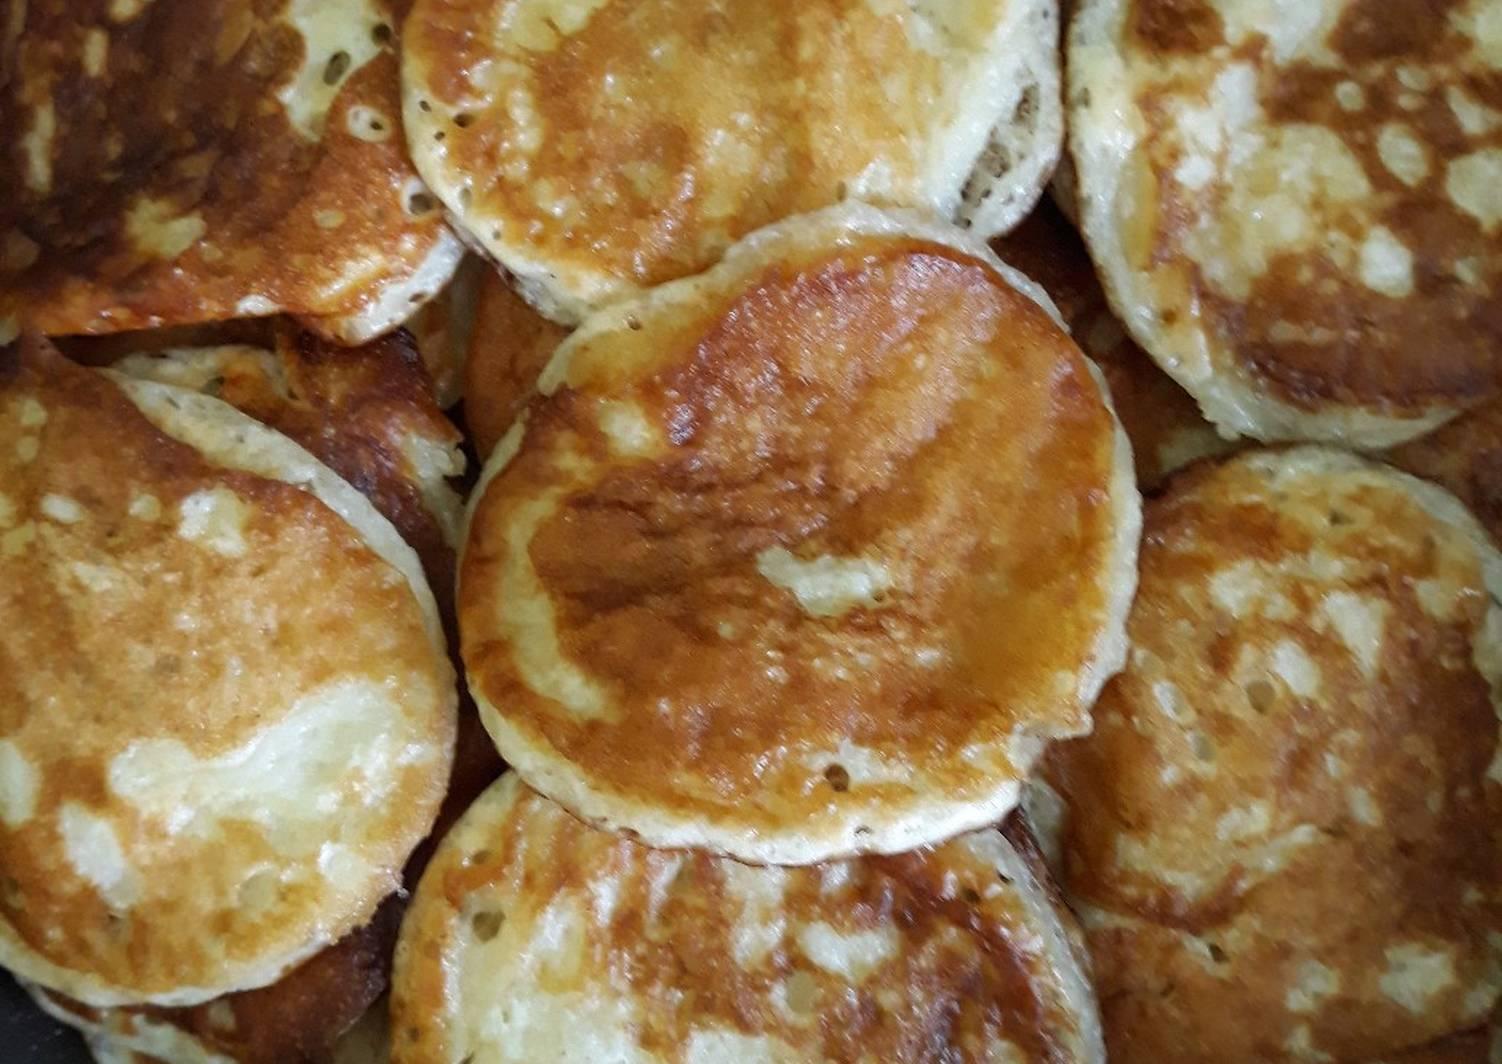 пирожки из кислого молока фото рецепт последние